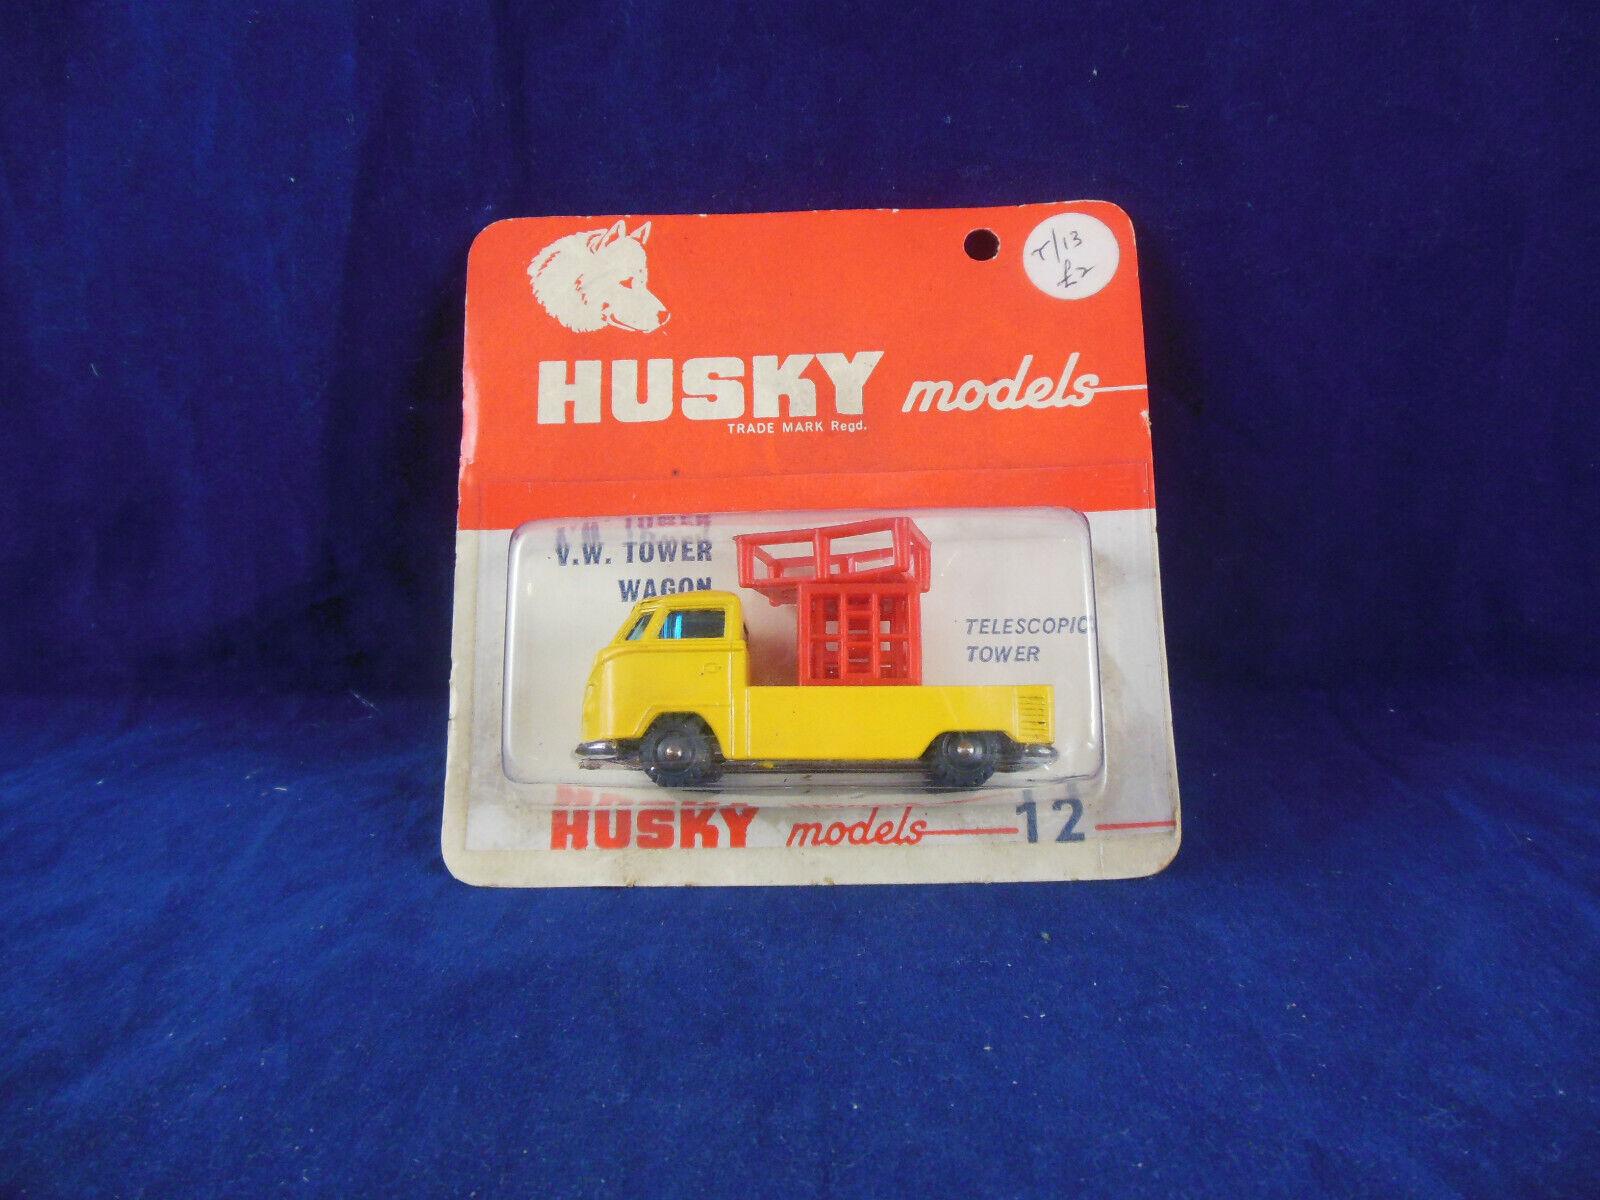 Husky Models no. 12 VW Tower Wagon Telescopic tower in orange   Red Volkswagen